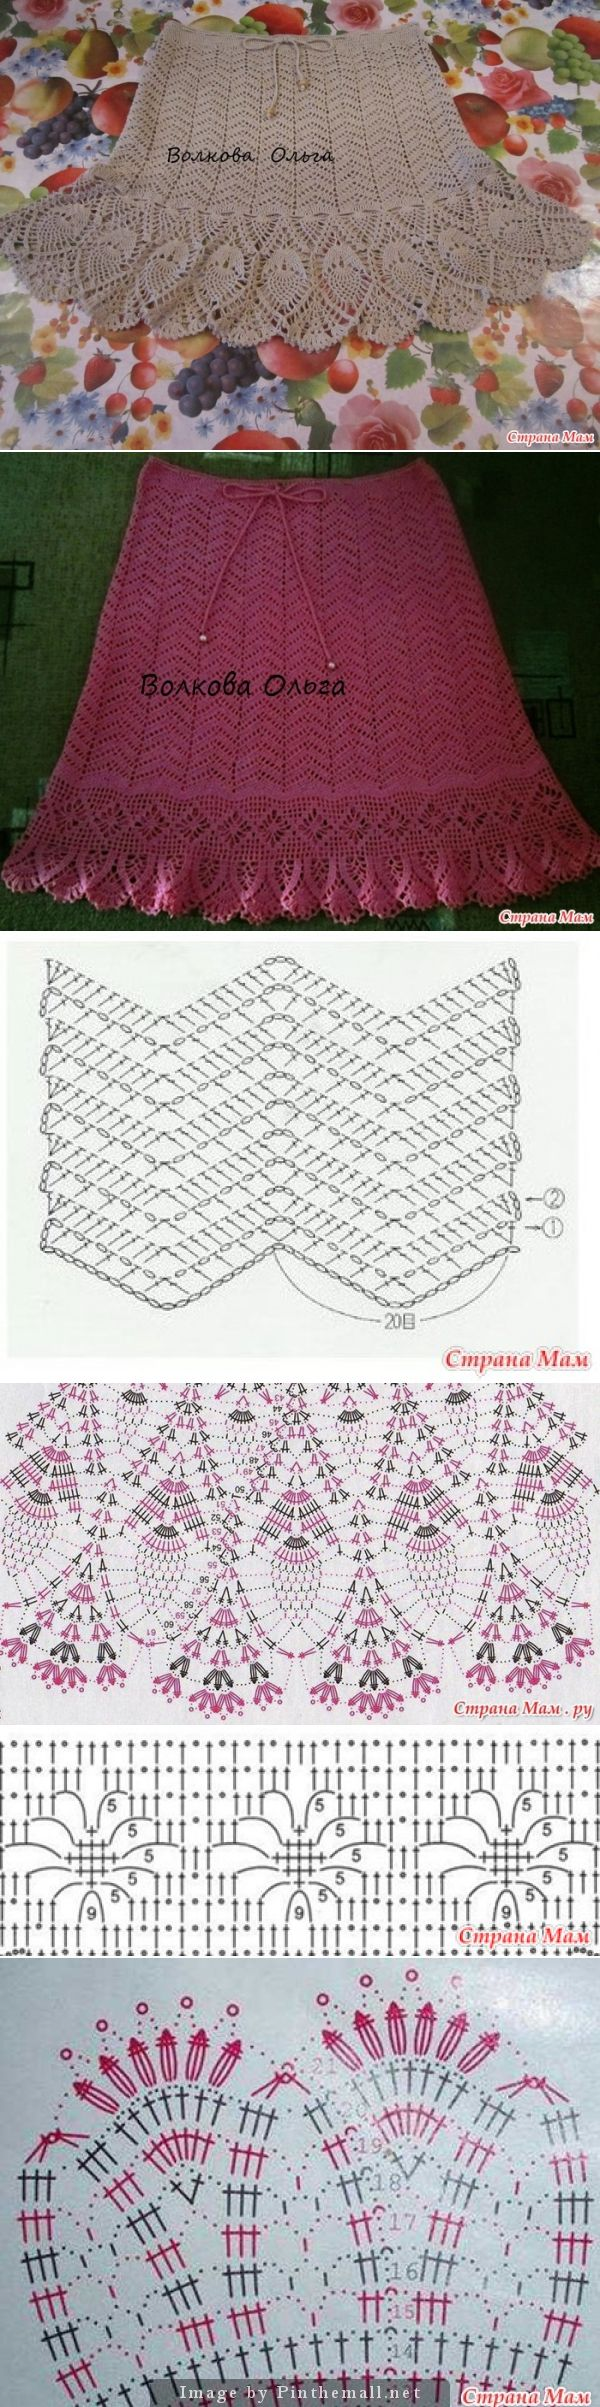 Crochet skirt ----- http://www.liveinternet.ru/users/4620503/rubric/2445801/page117.html